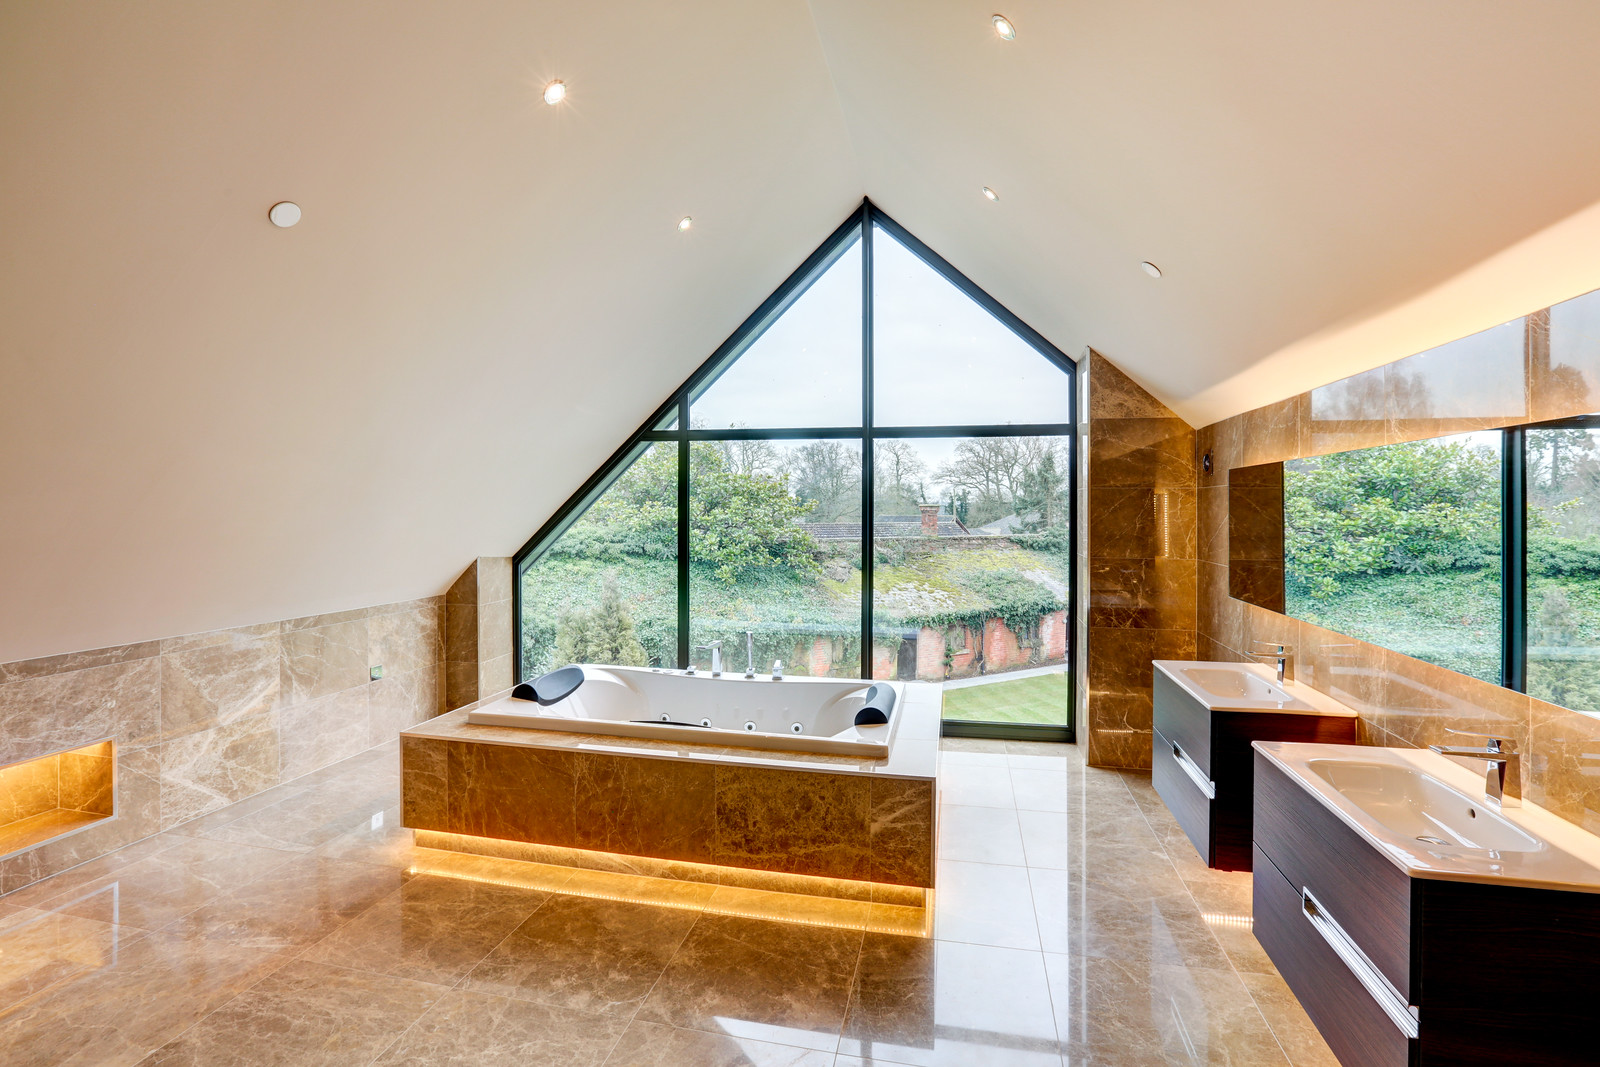 Marble bathroom, inset bath, Luxury home, Tanglewood in Colston Bassett, Nottingham